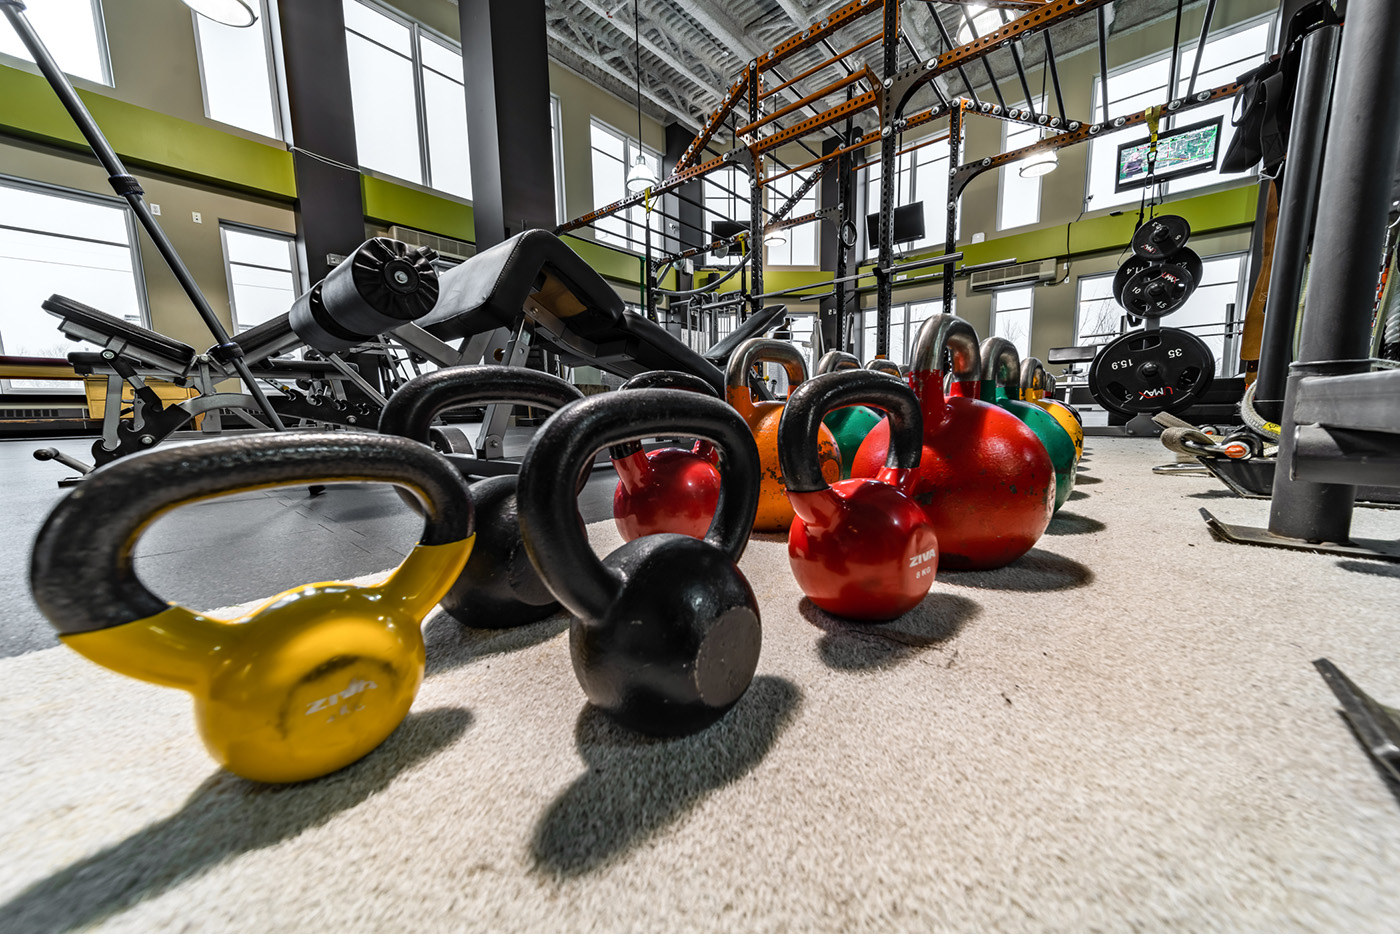 cityfit-gym-personal-training-calgary-workout-facility-inglewood-7.jpg